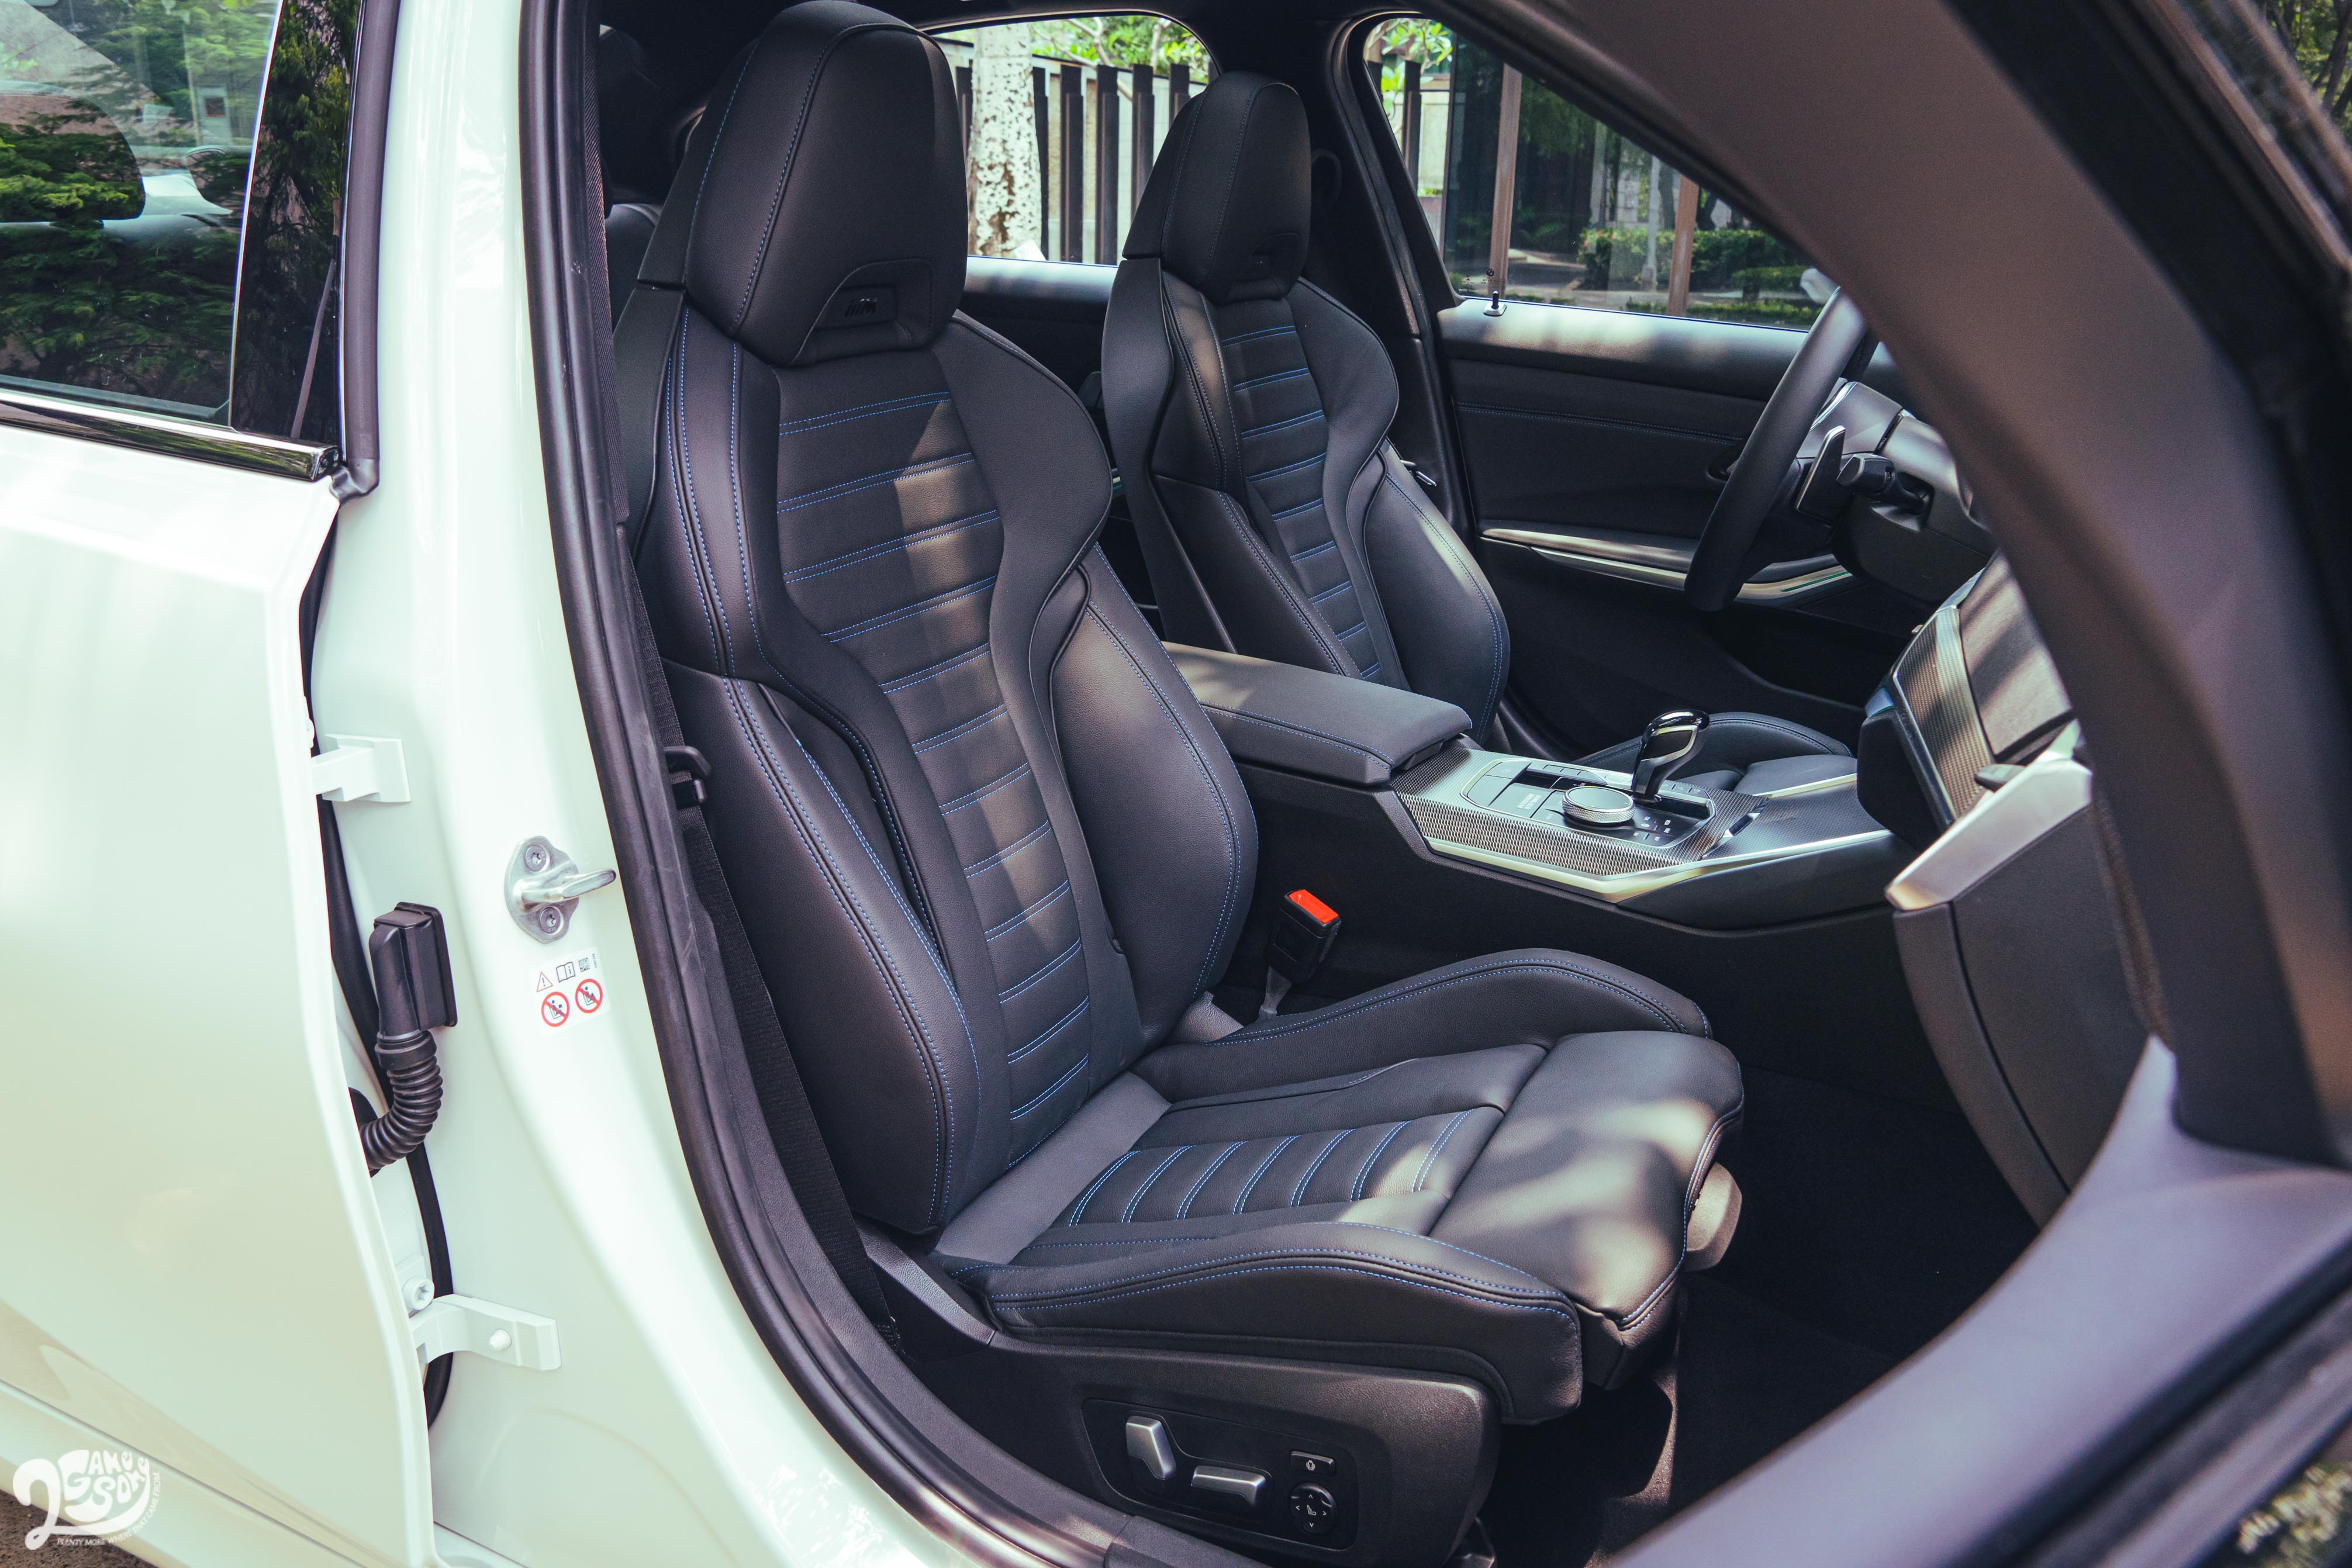 M跑車座椅豐富的調整功能,讓我很快就能找到自己喜歡的駕駛姿勢。